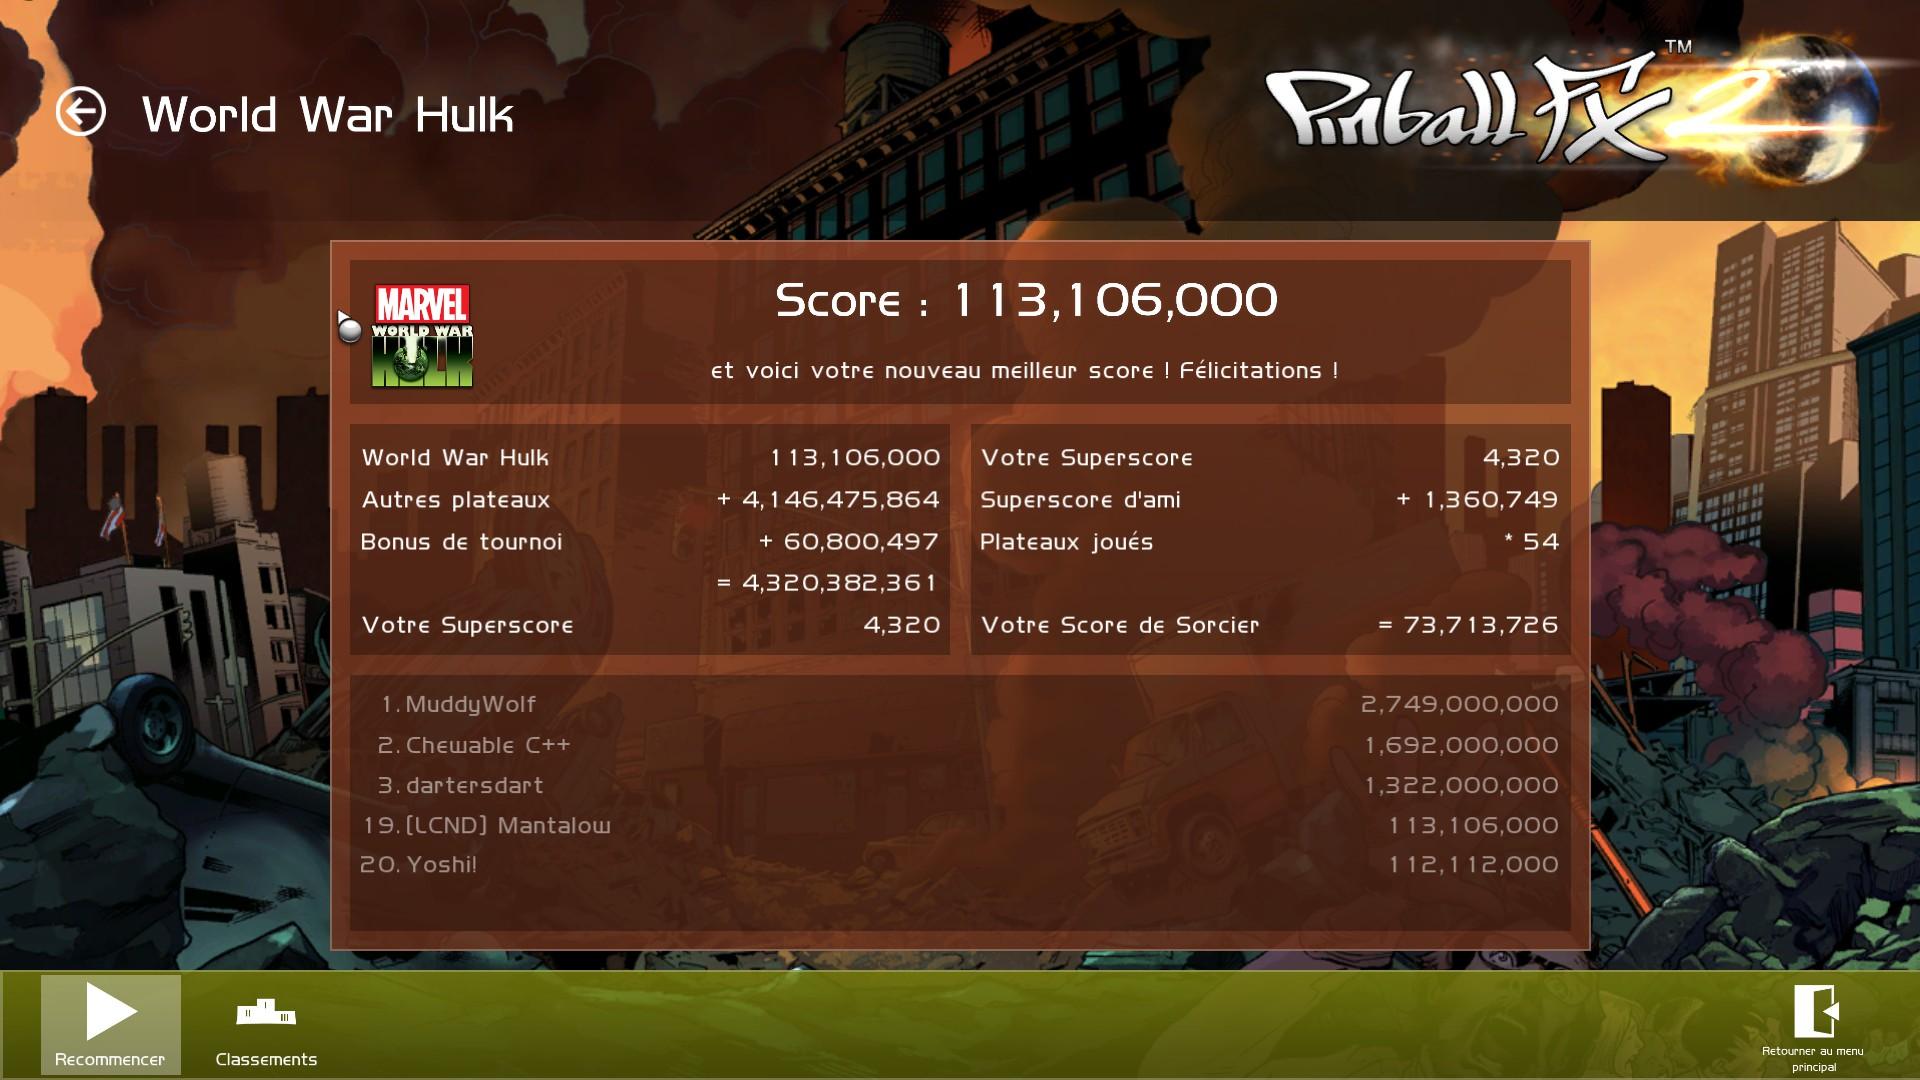 Mantalow: Pinball FX 2: Marvel: World War Hulk (PC) 113,106,000 points on 2015-07-22 04:45:40